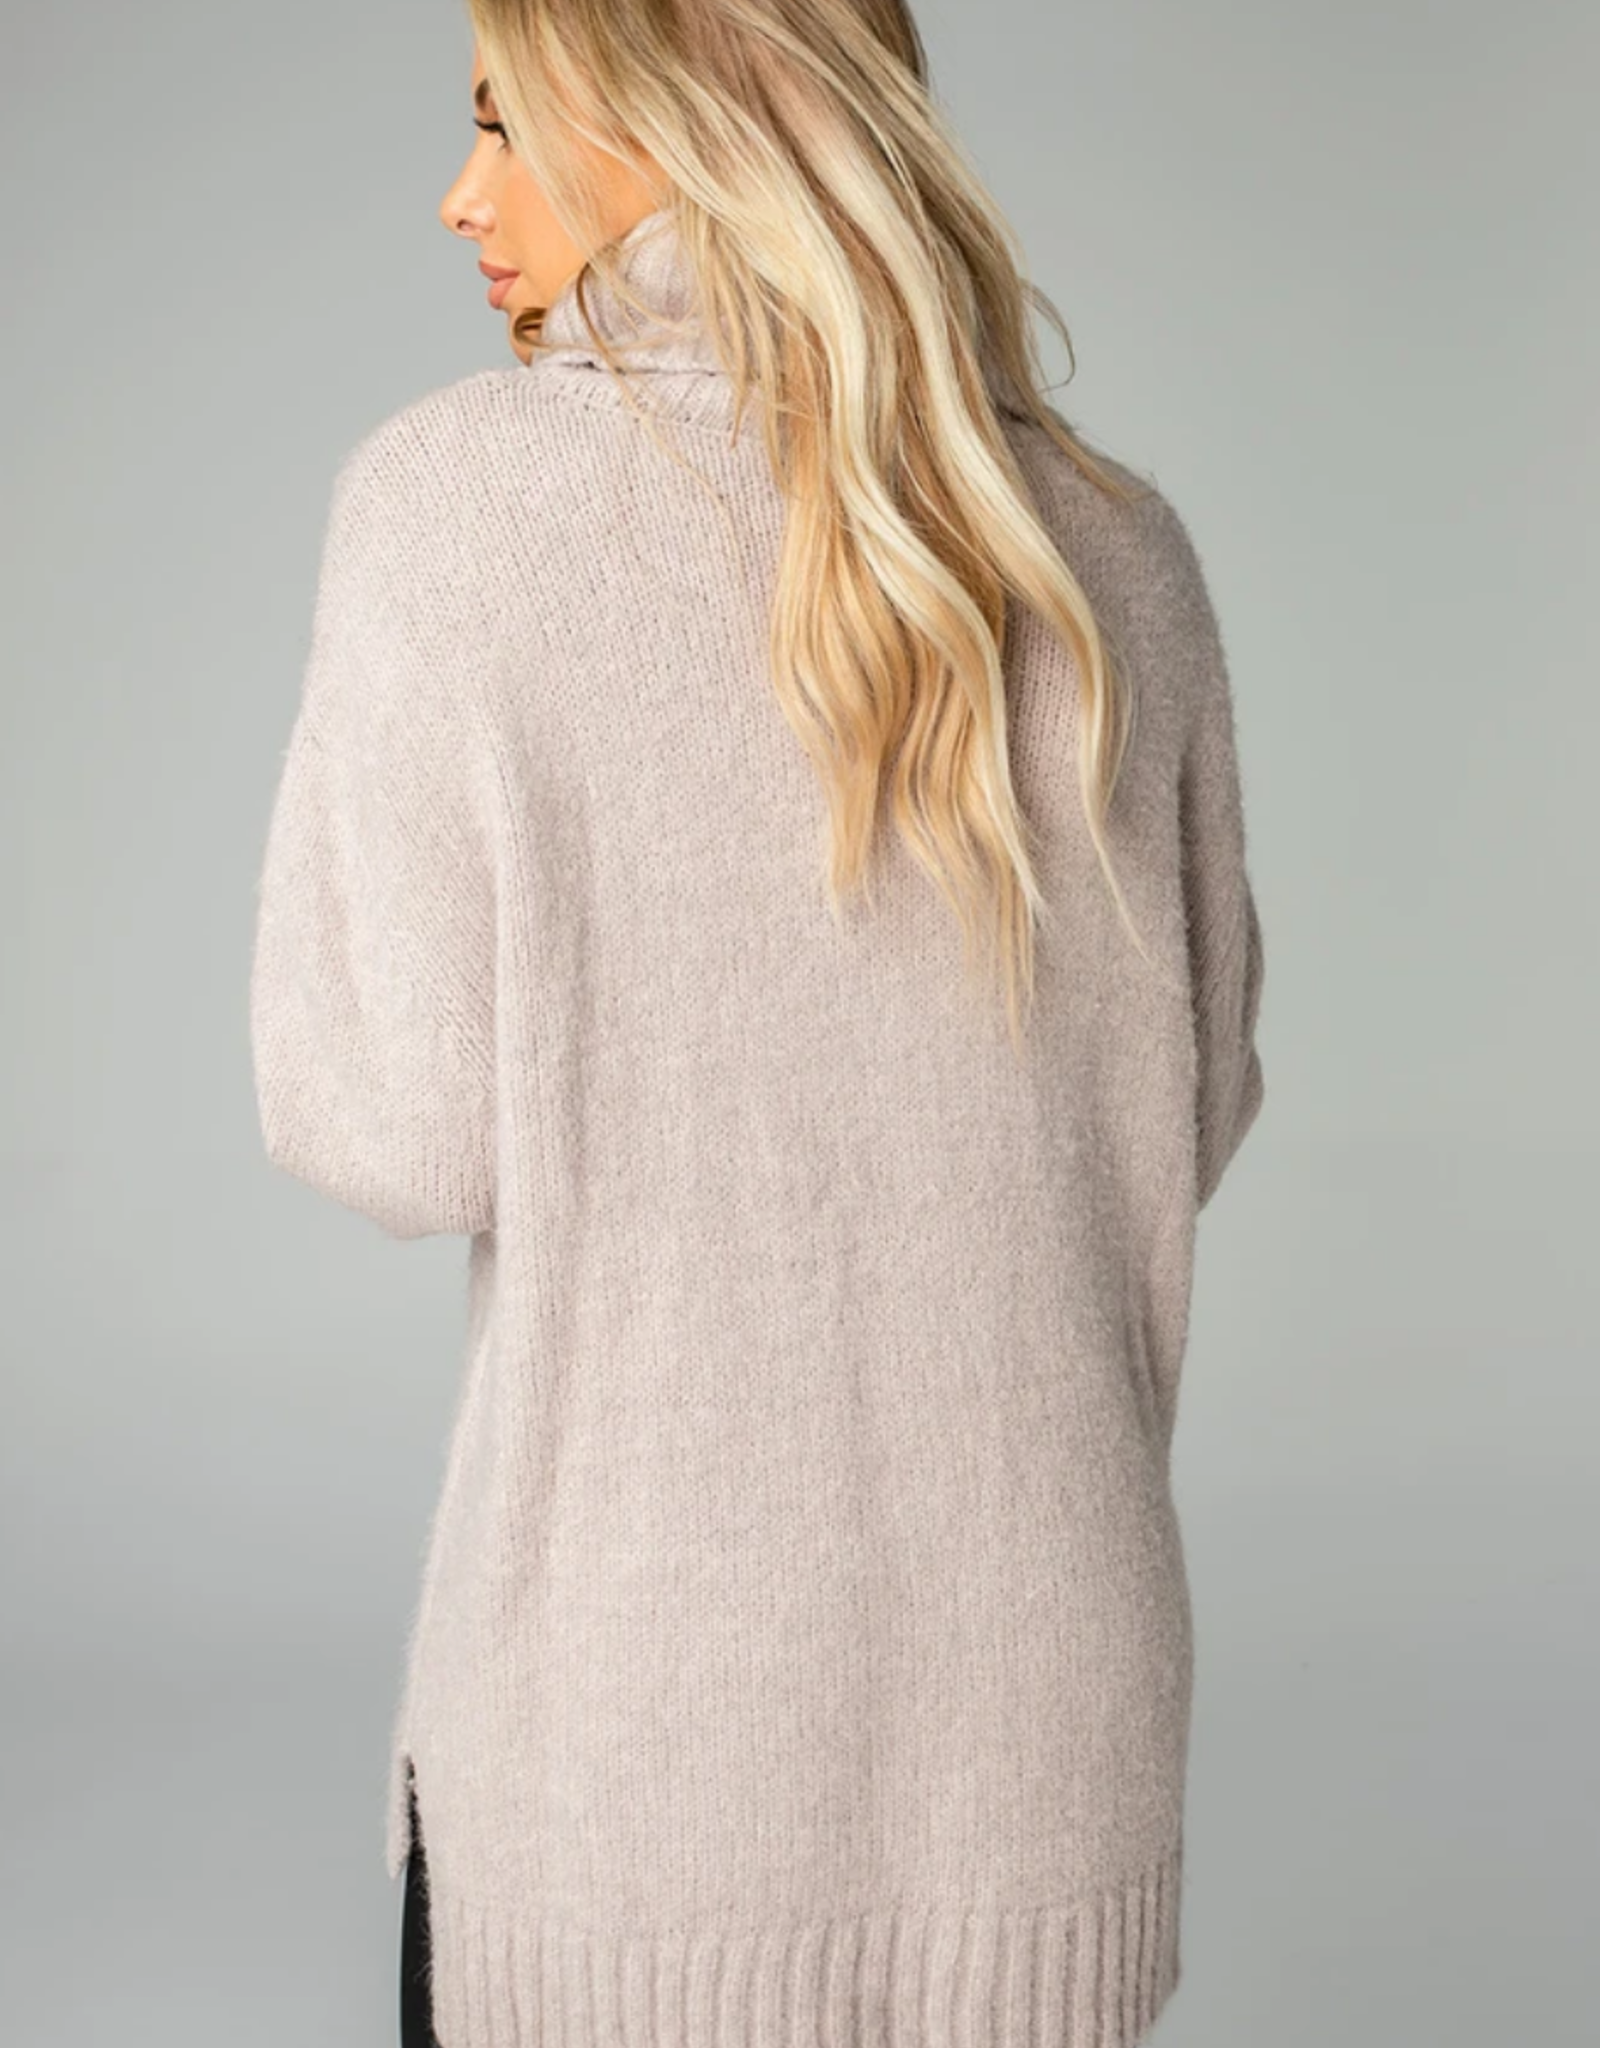 Buddy Love Karen Cowl Neck Tunic Sweater